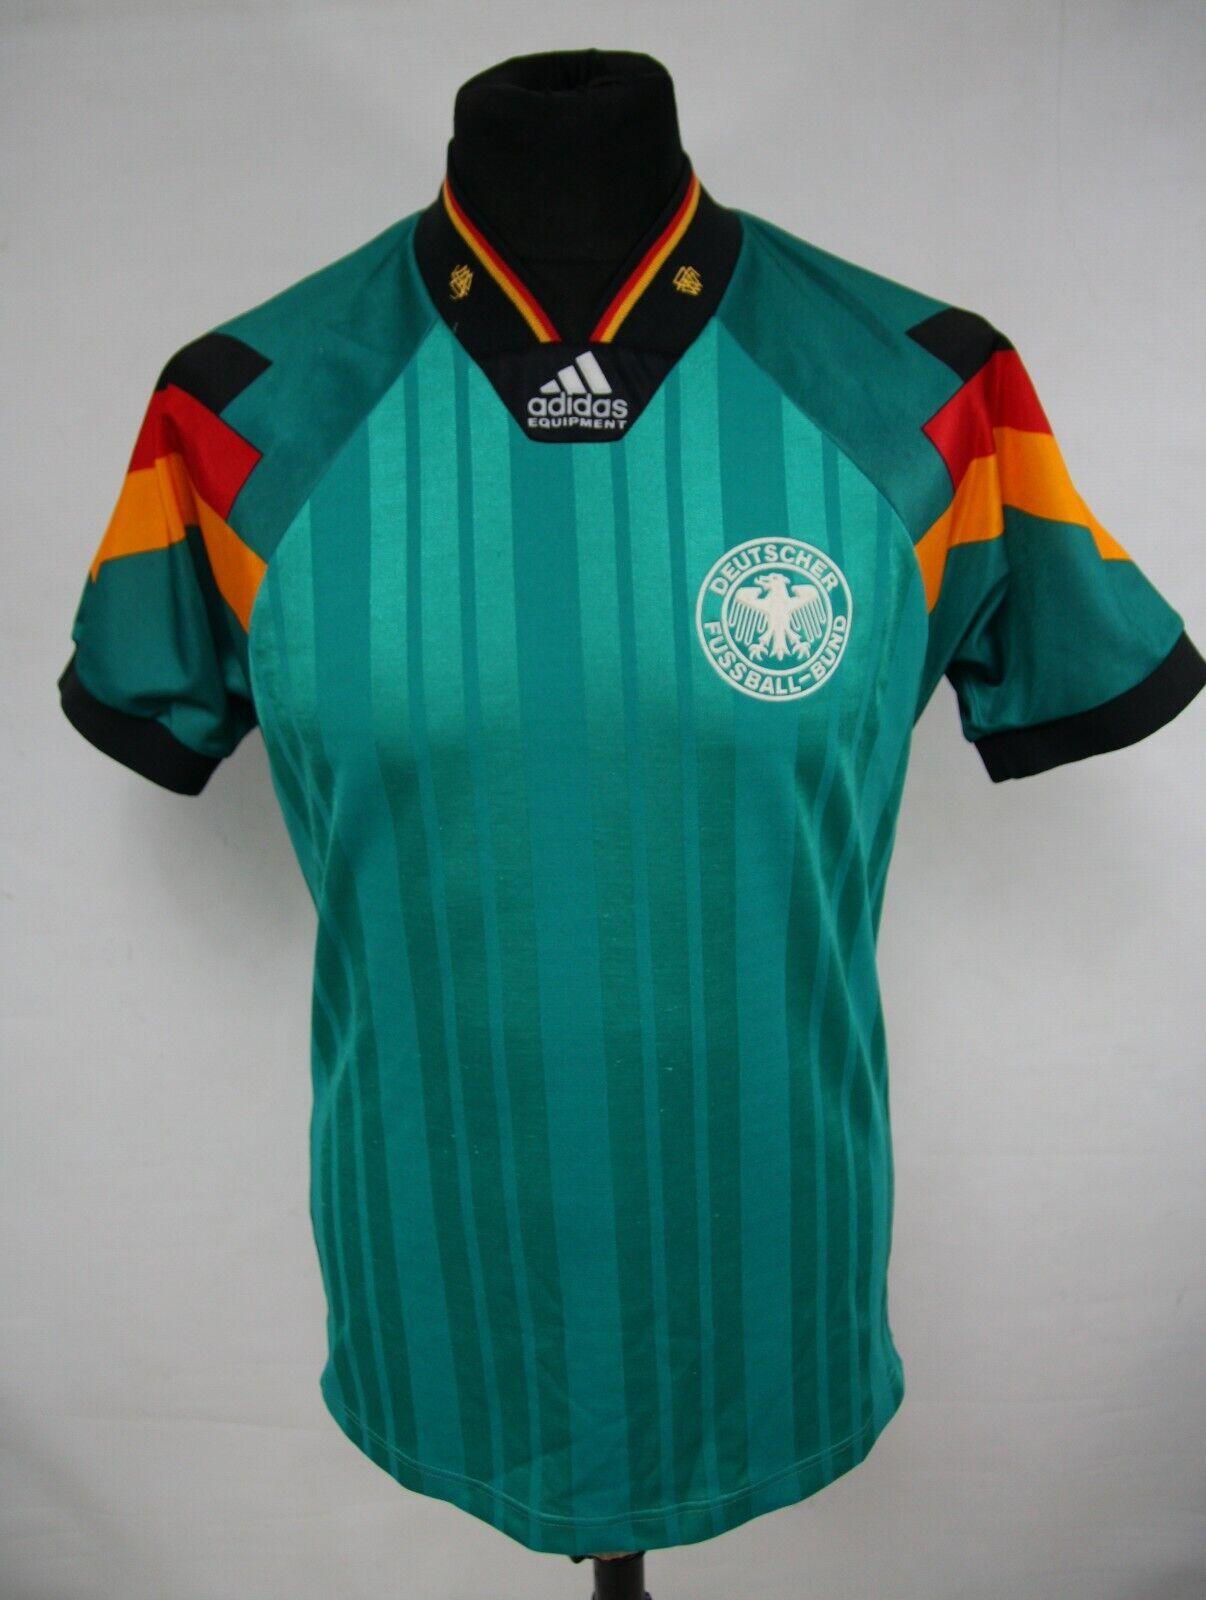 ADIDAS Germania via _ 19921994 _ Calcio Maglia Taglia S __ V176